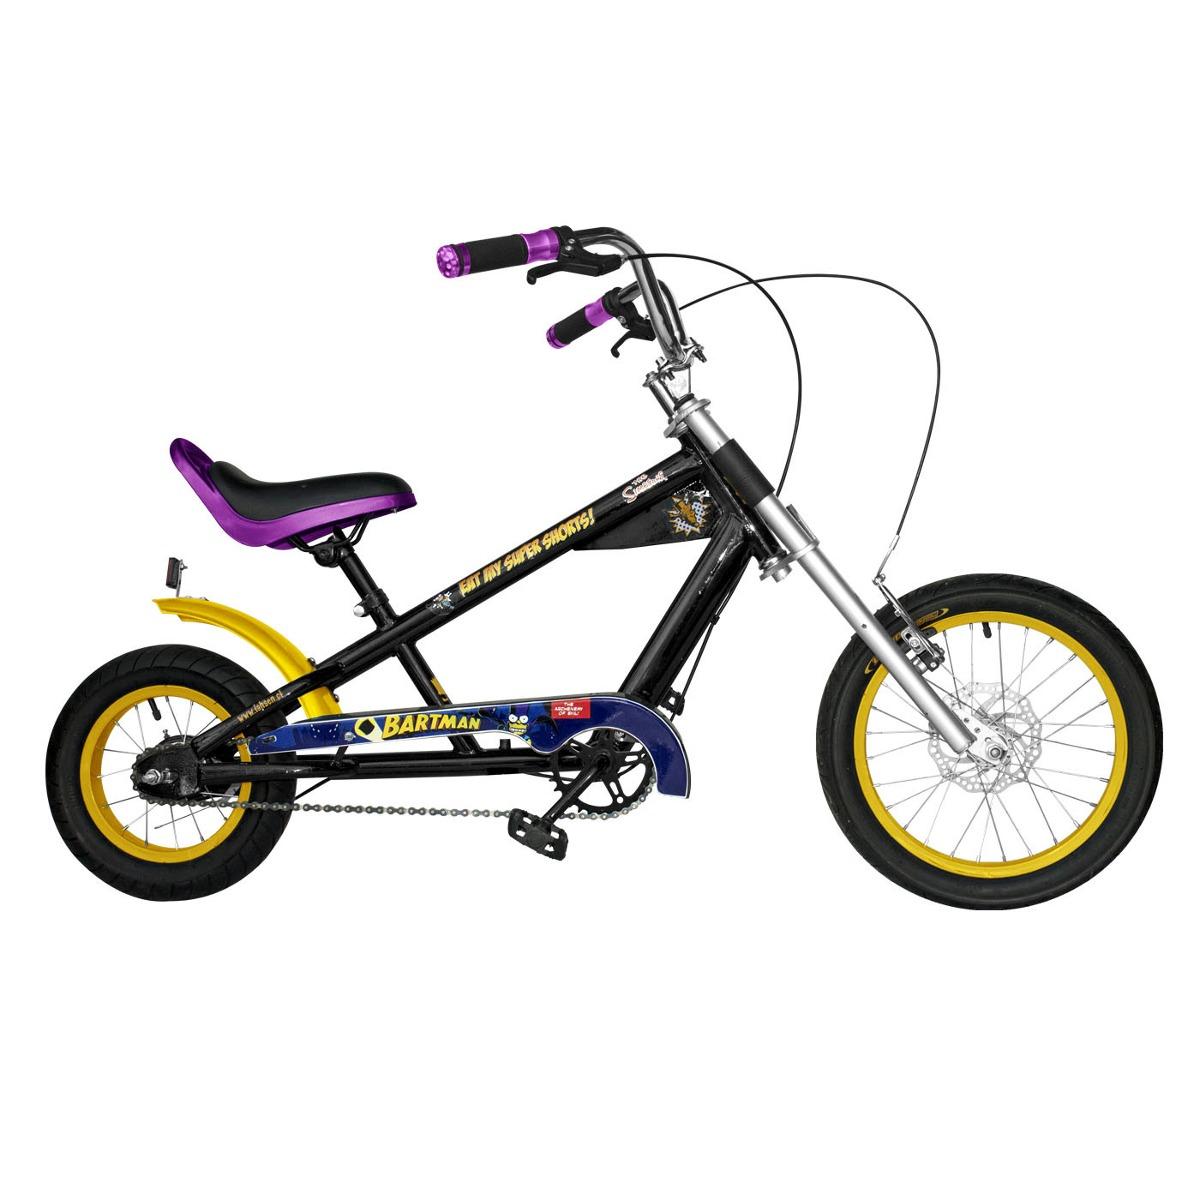 Tienda De Bicicletas Choppers Pictures to Pin on Pinterest ...